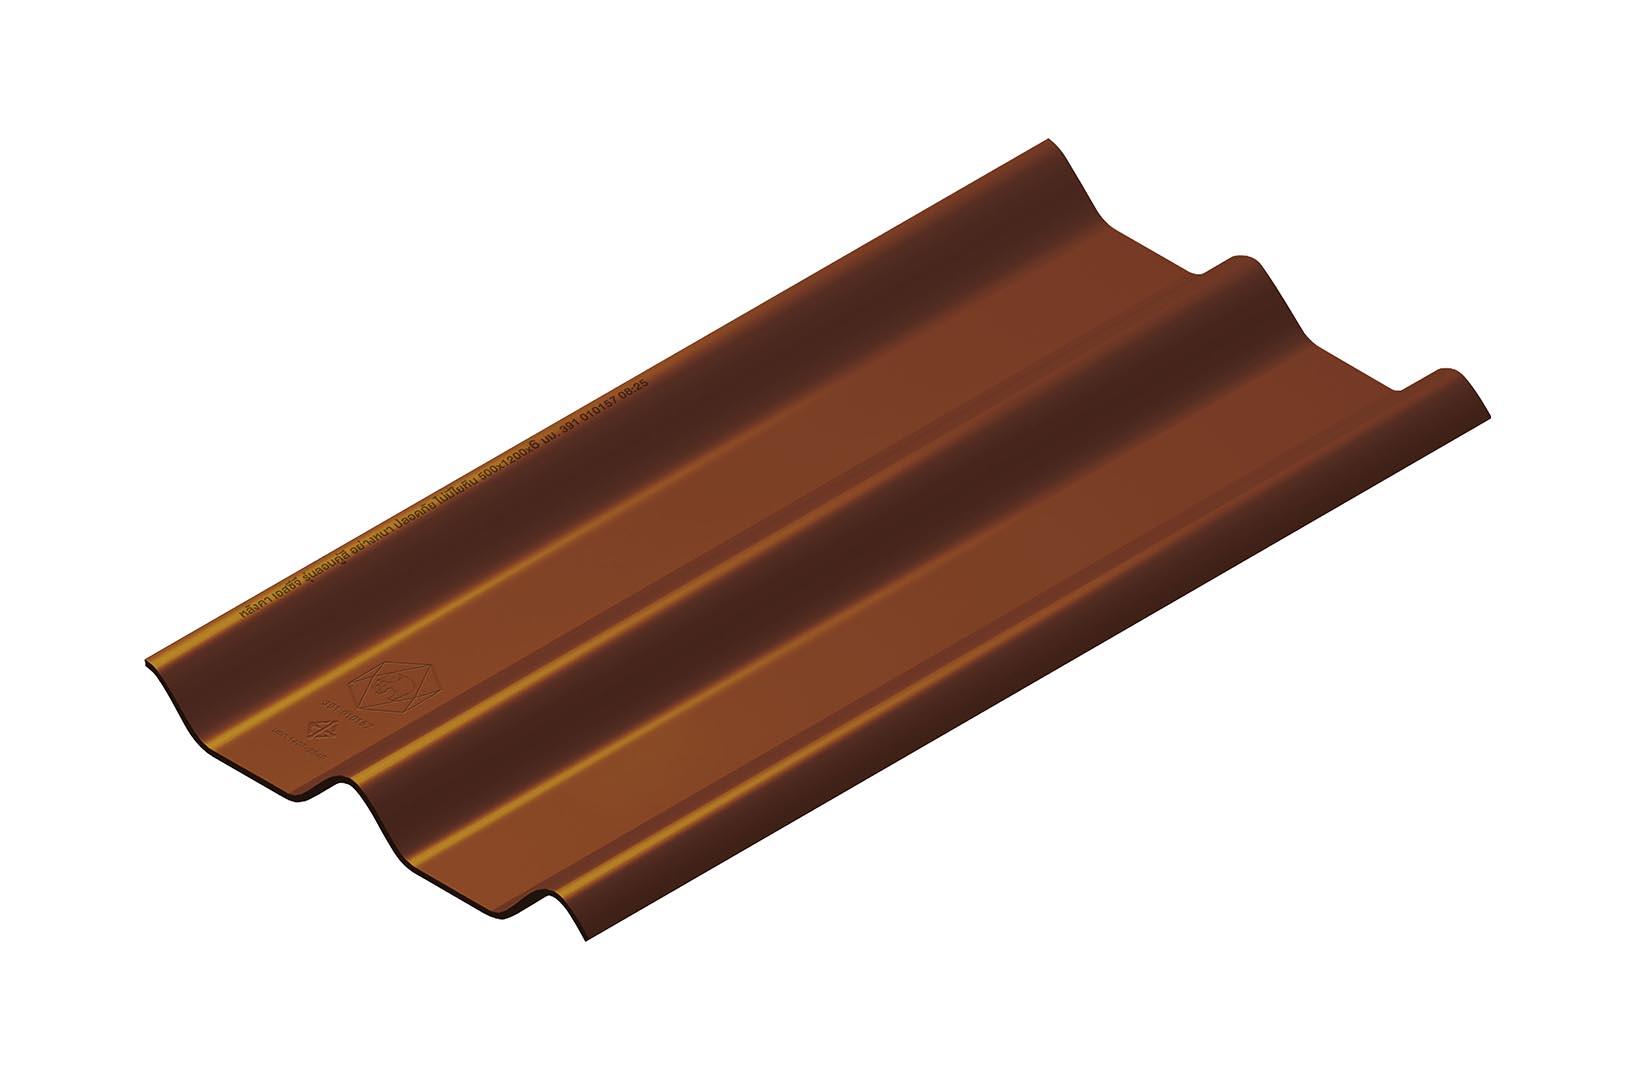 SCG-Fiber-Cement-Roof-Roman-Tile-Cocoa